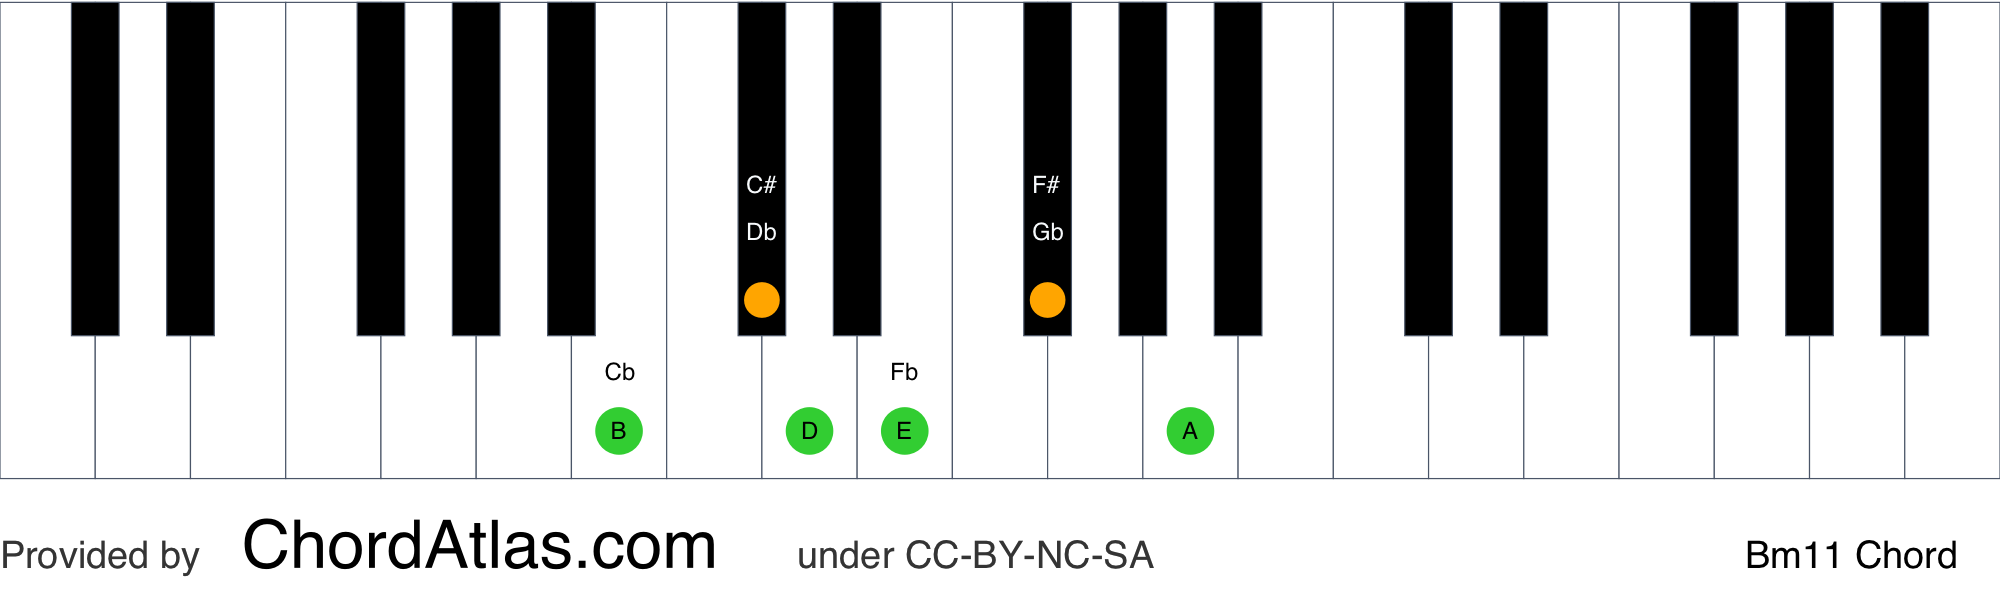 B minor eleventh piano chord   Bm15   ChordAtlas